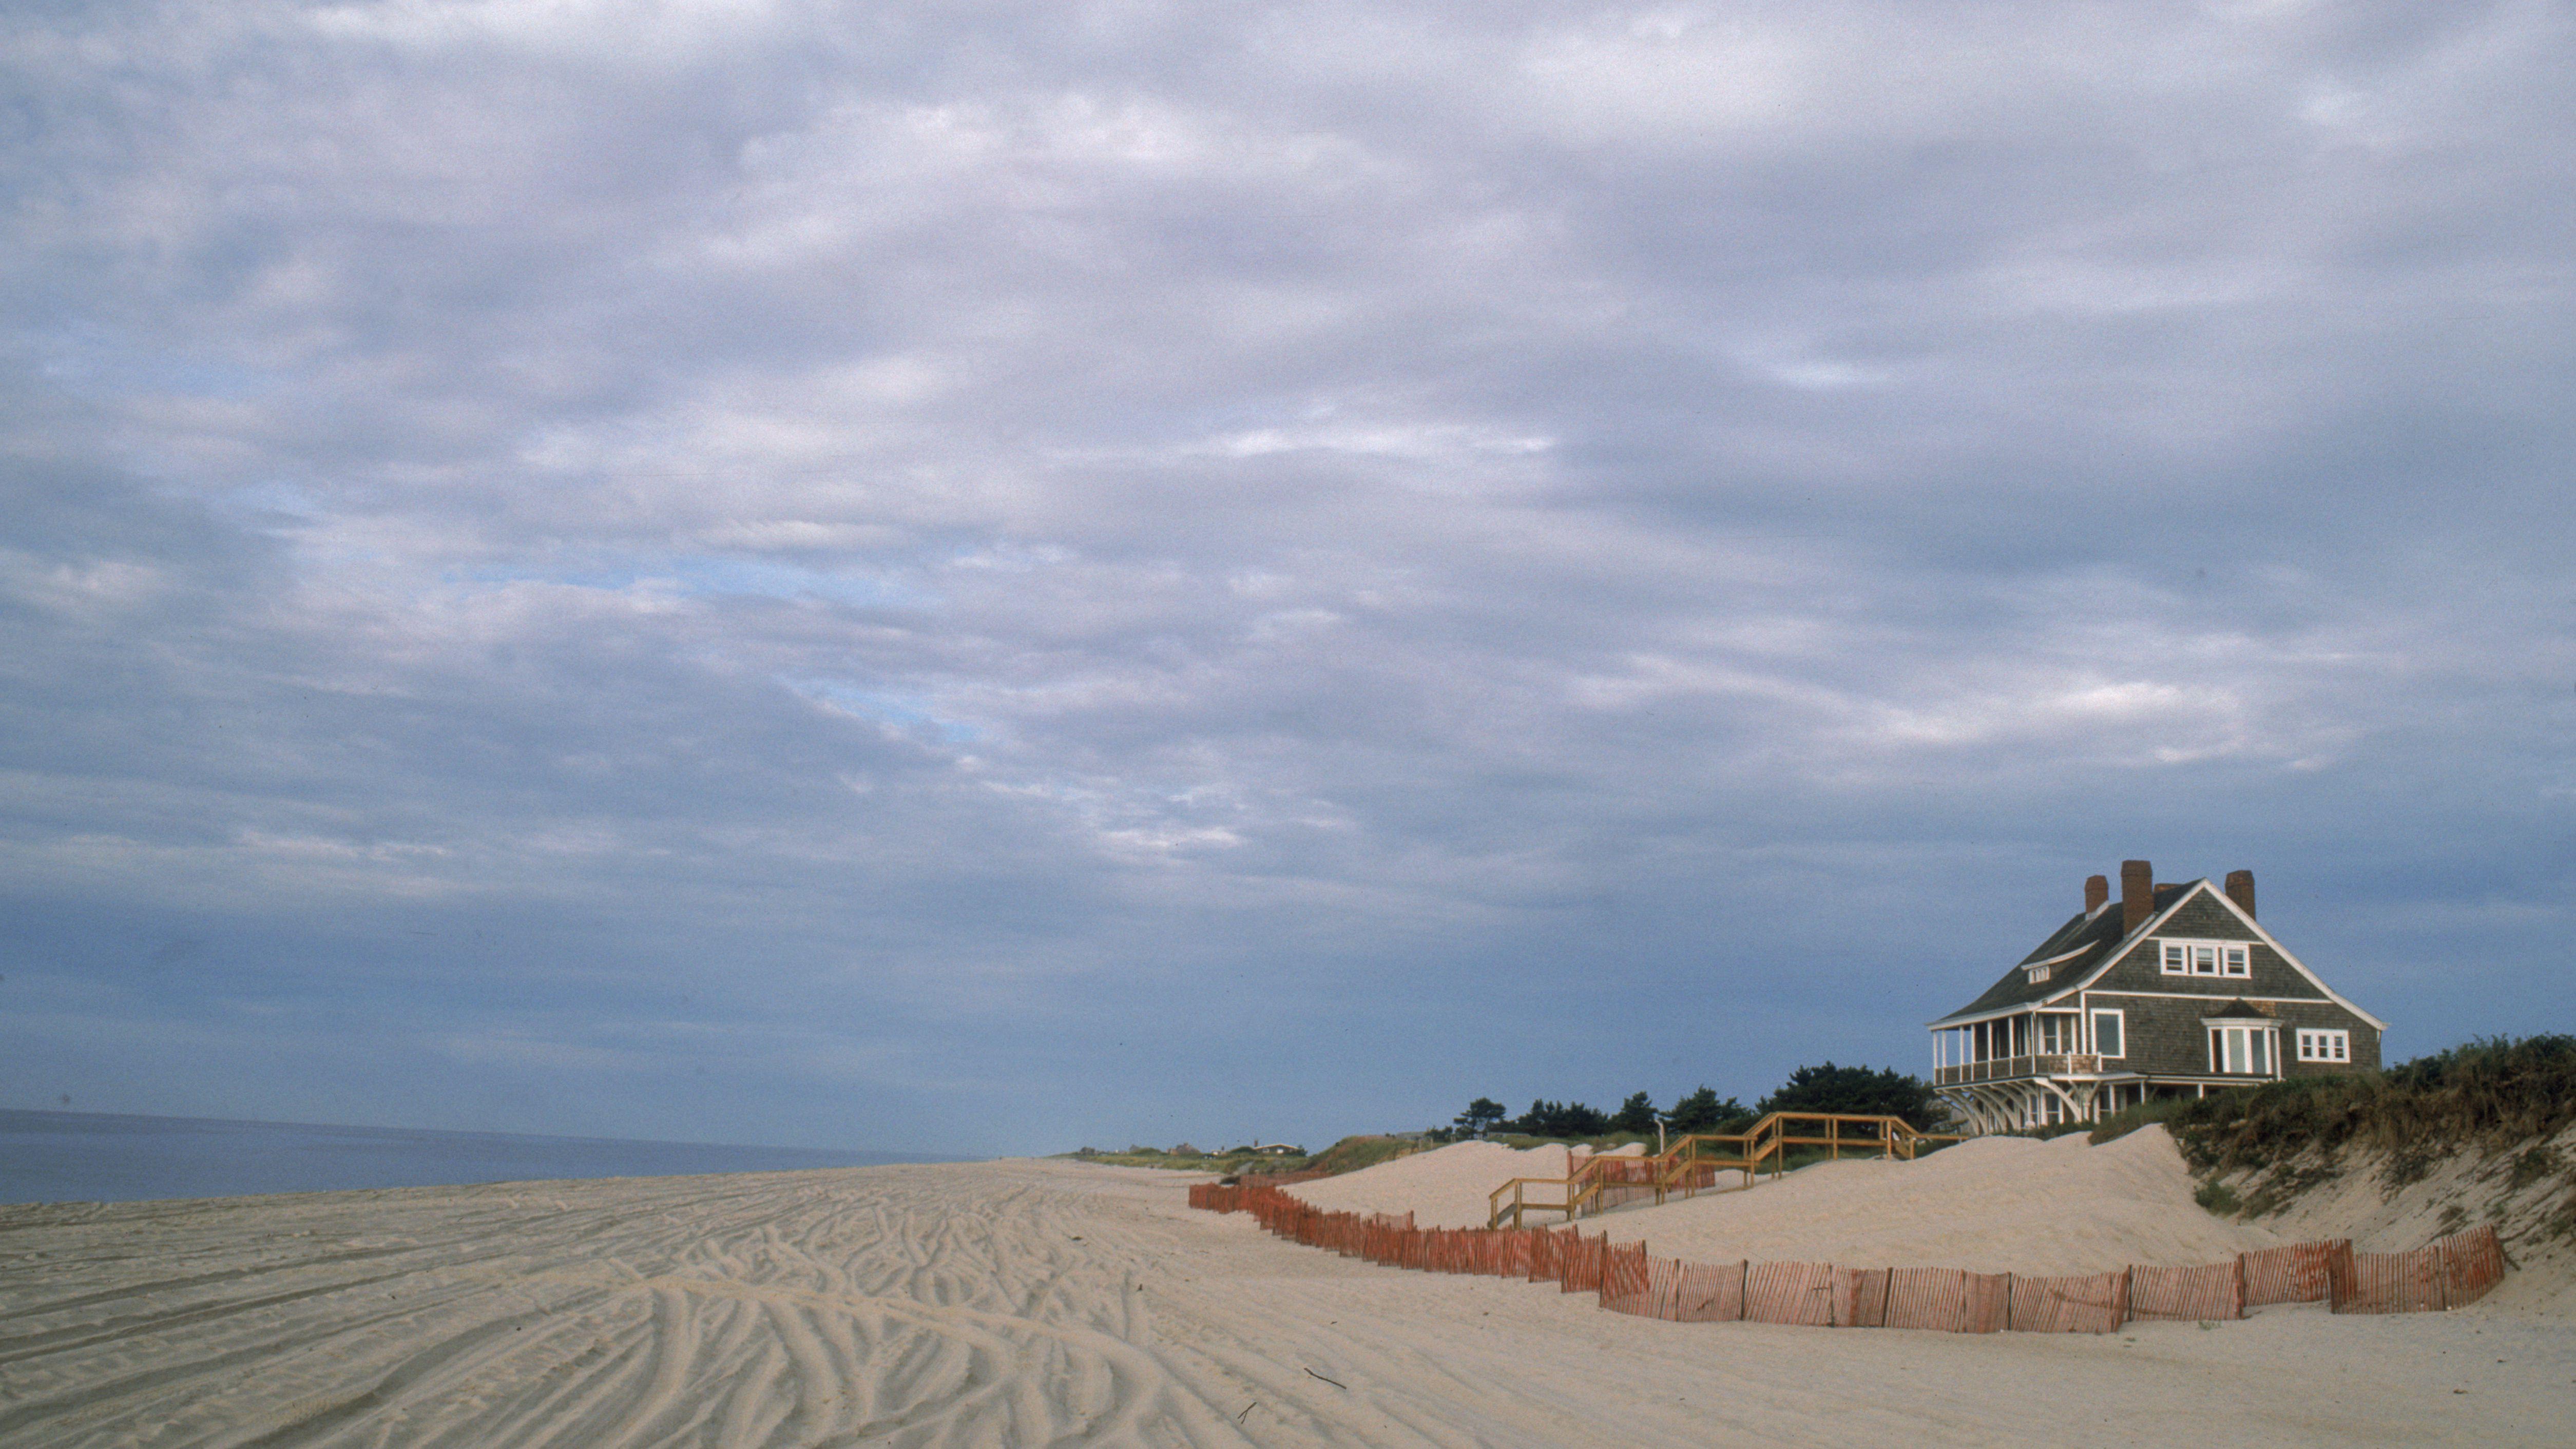 Plan a Hamptons Beach Getaway From New York City